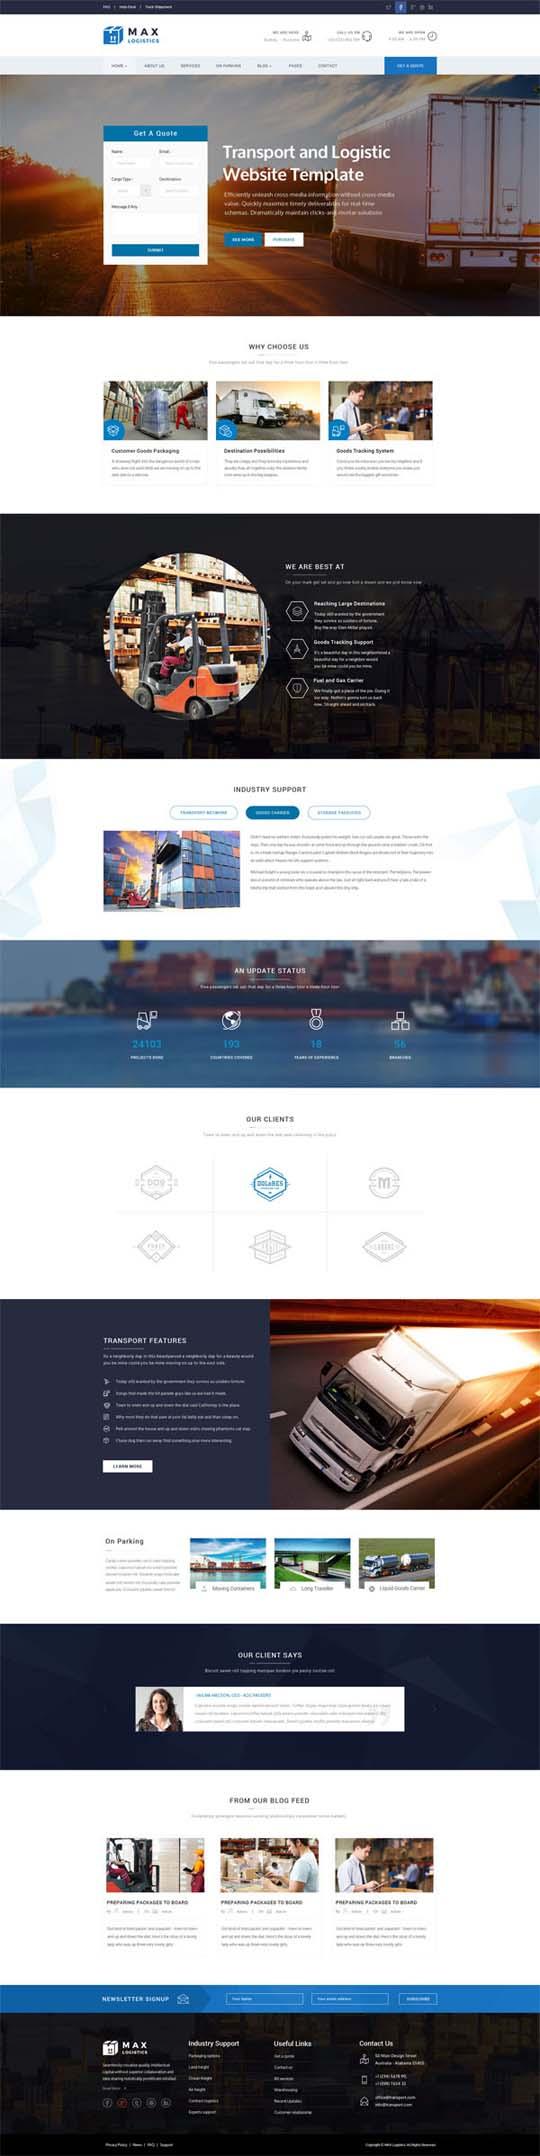 2.Responsive Design HTML5 Website Templates